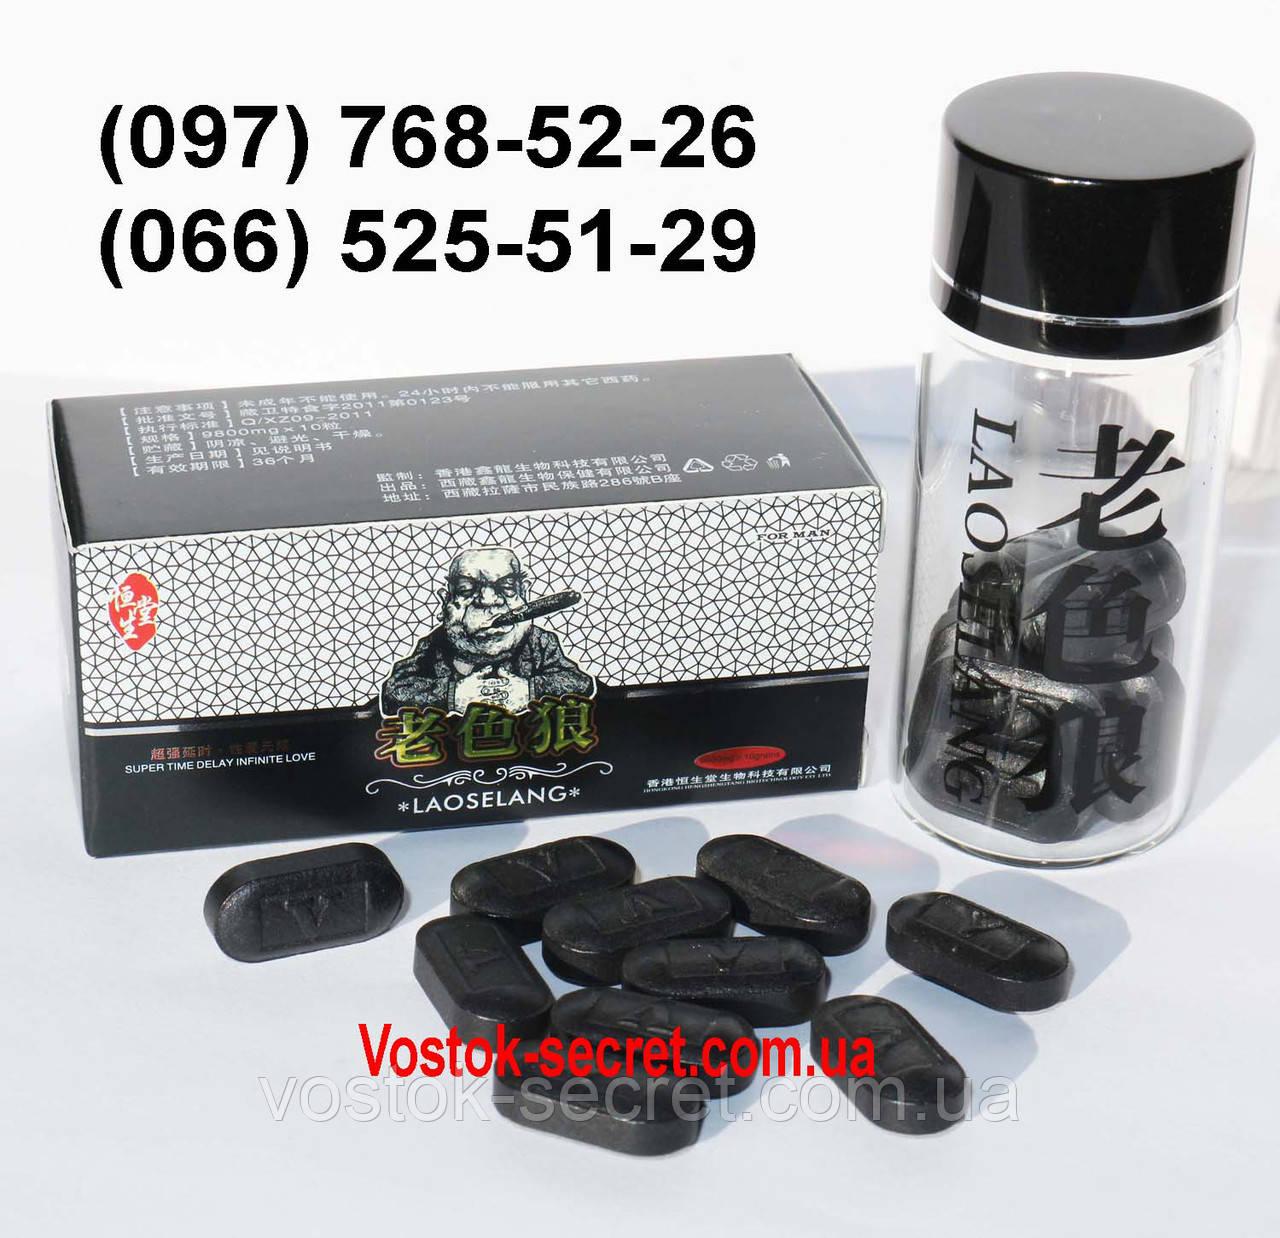 Китайский препарат для потенции Laoselang. 10табл.